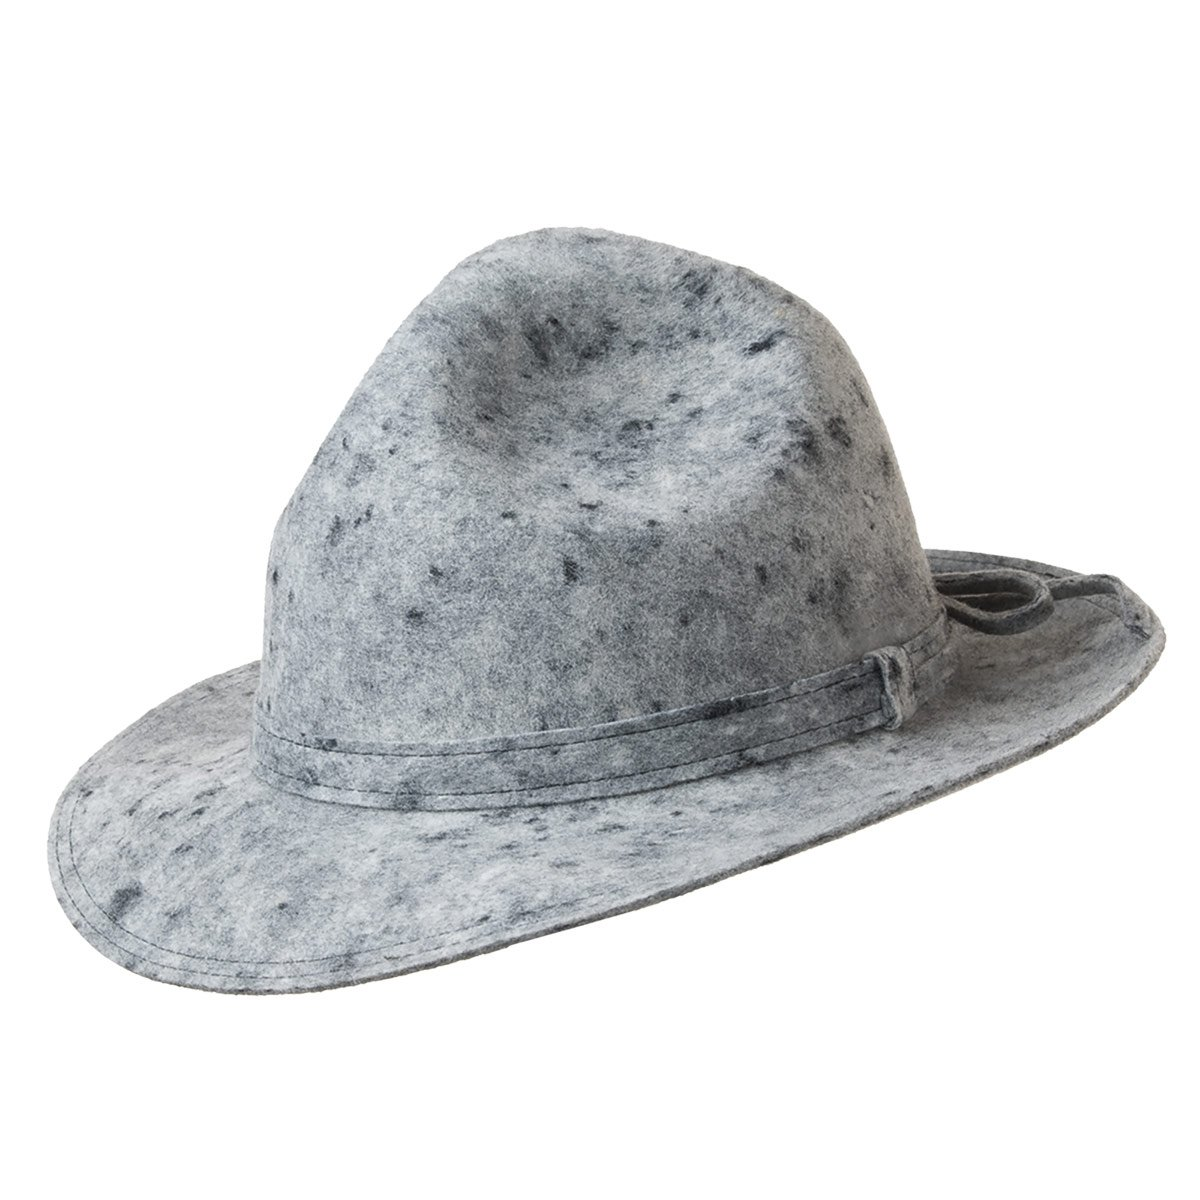 f92c81459b9 Tyrolean hat in woolfelt jpg 1200x1200 Tyrolean hat brush